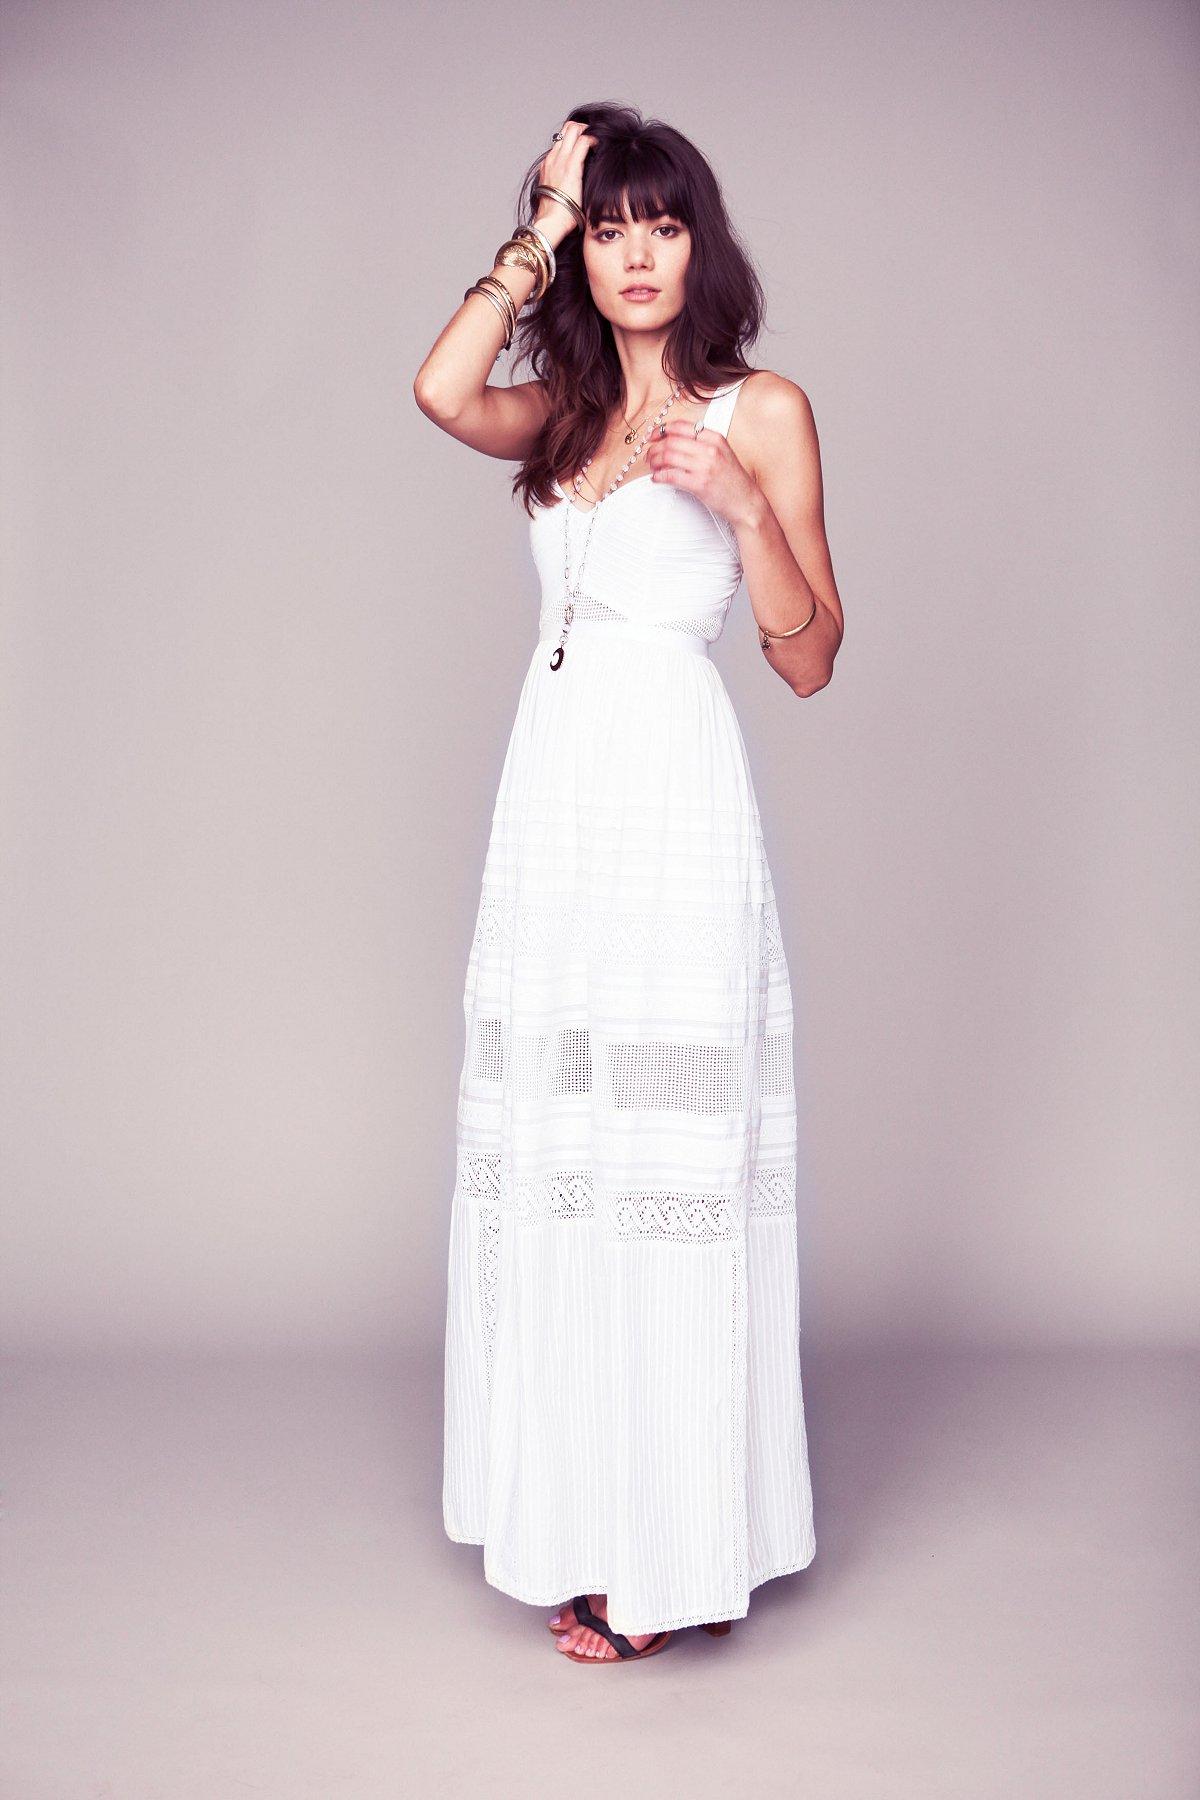 Jill's Limited Edition Bustier Dress